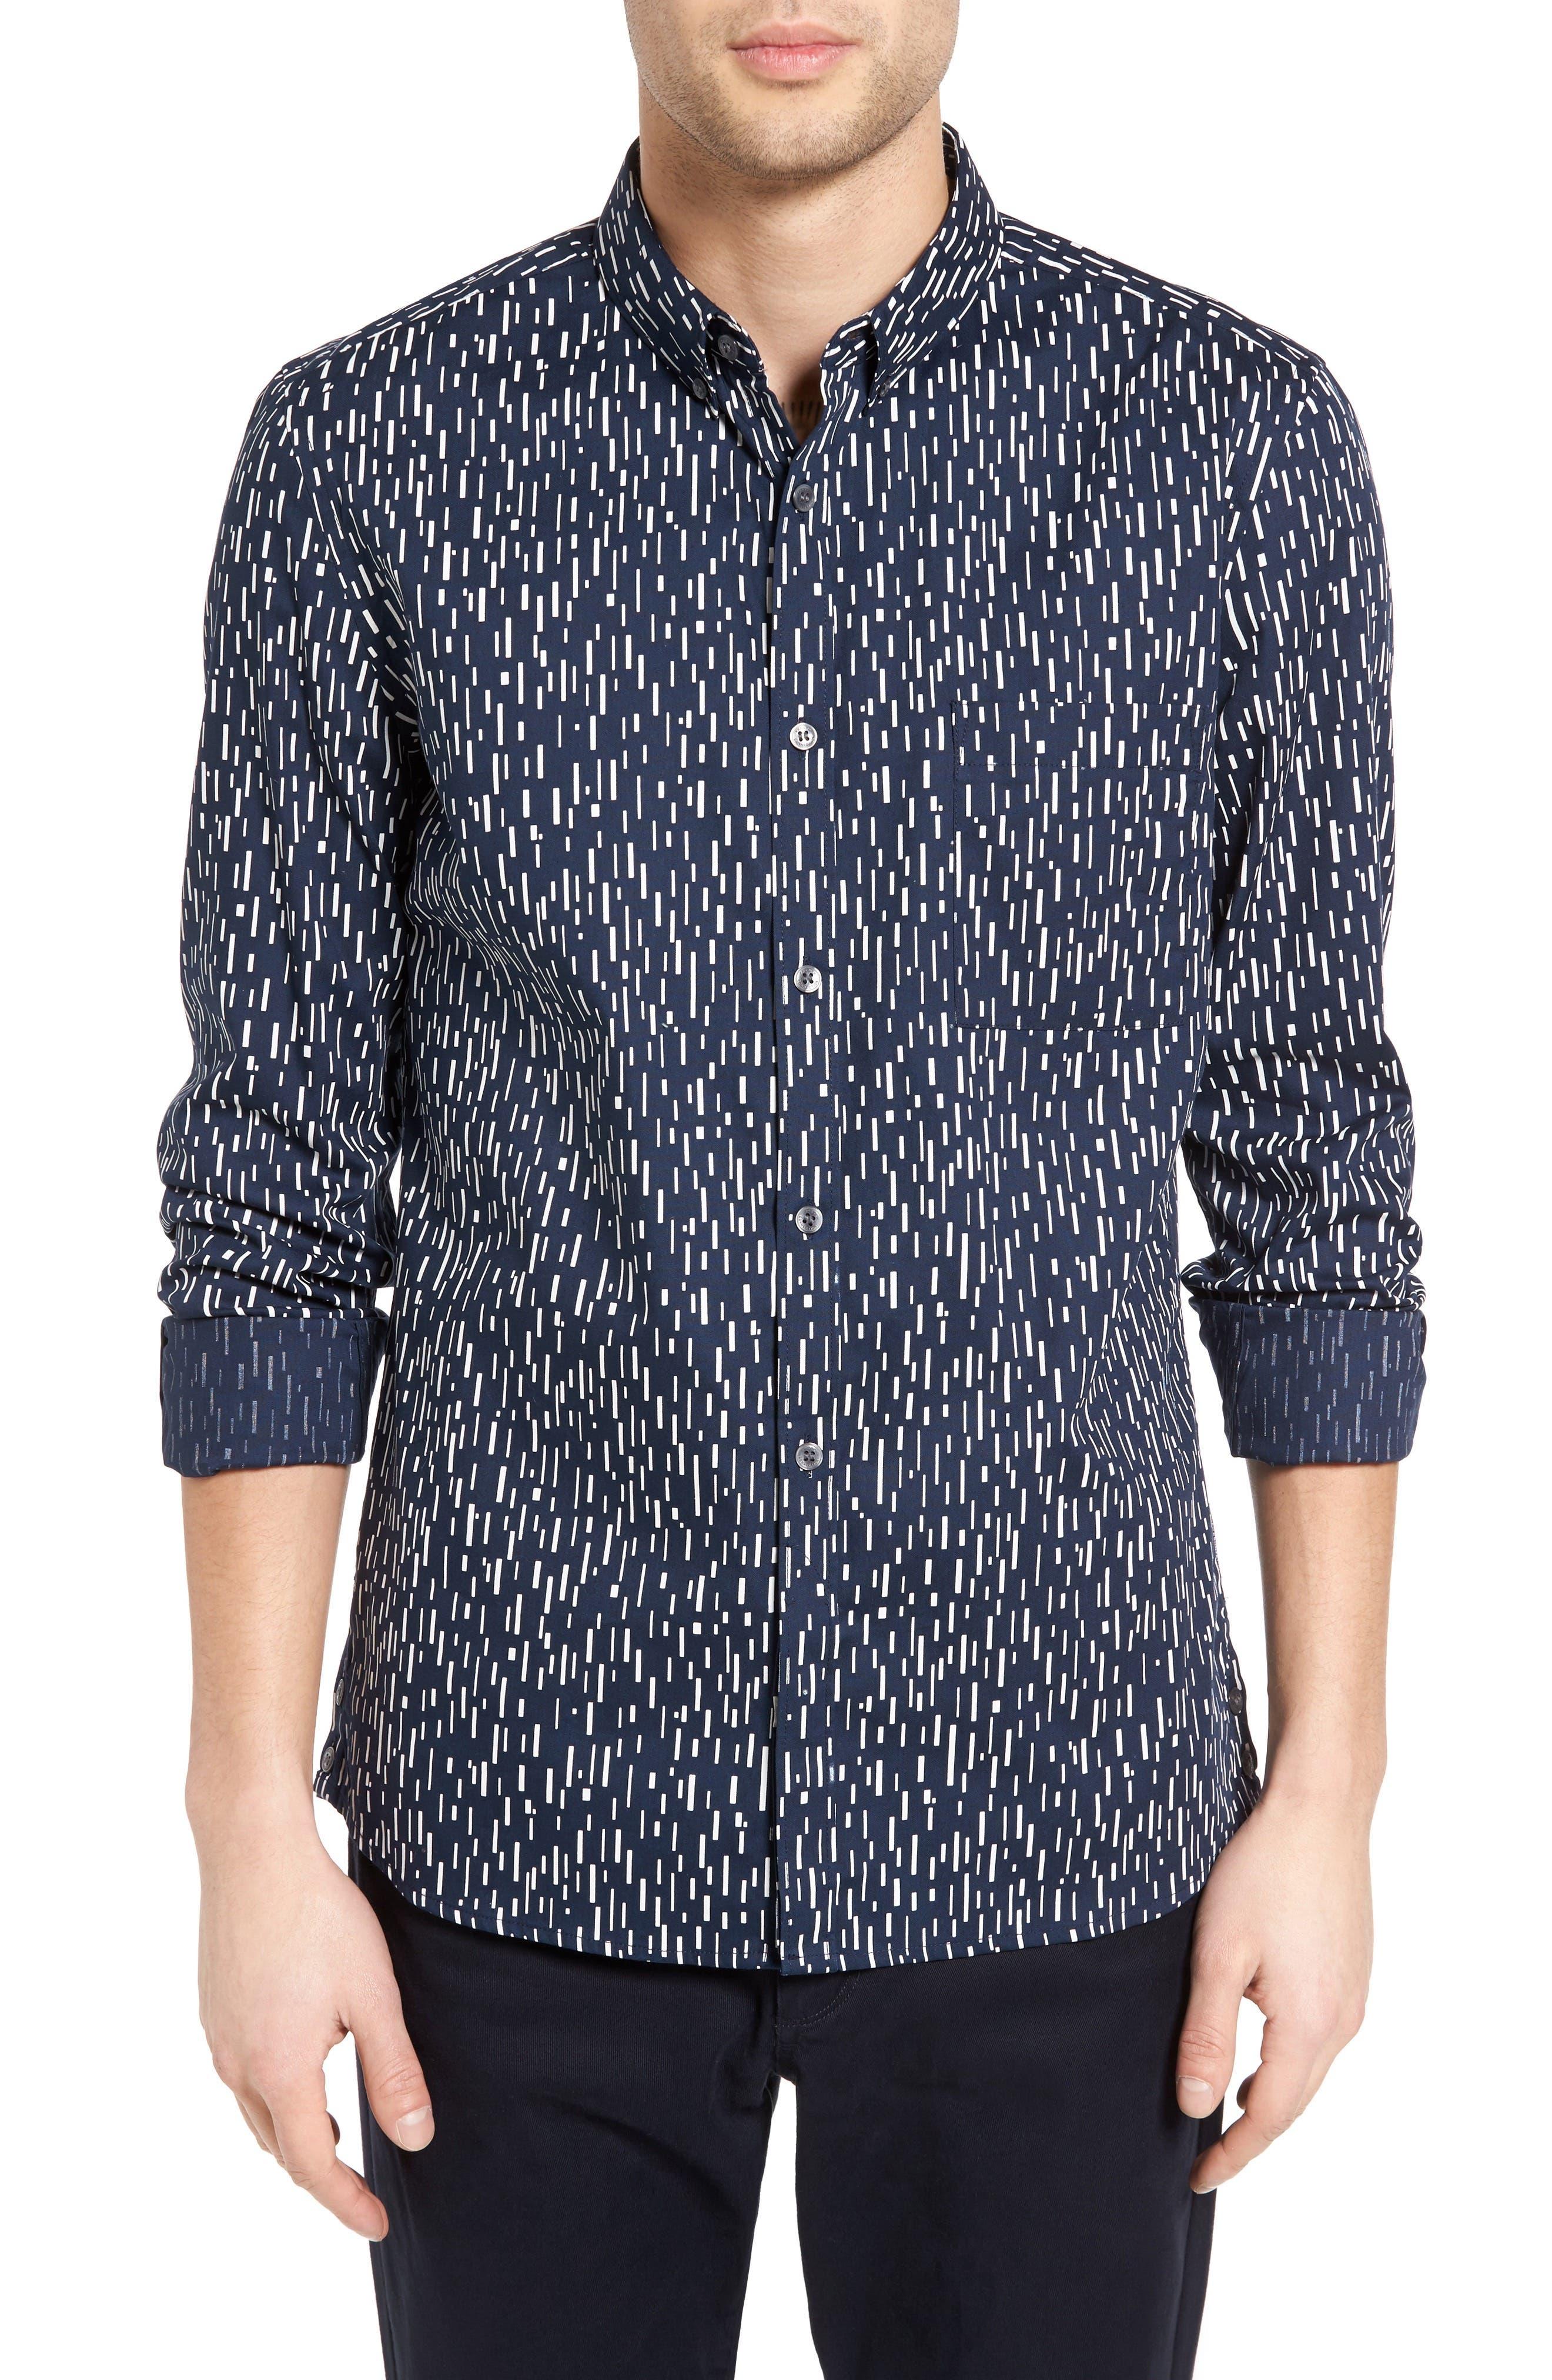 Rain Dash Slim Fit Oxford Shirt,                             Main thumbnail 1, color,                             Marine Blue/ White